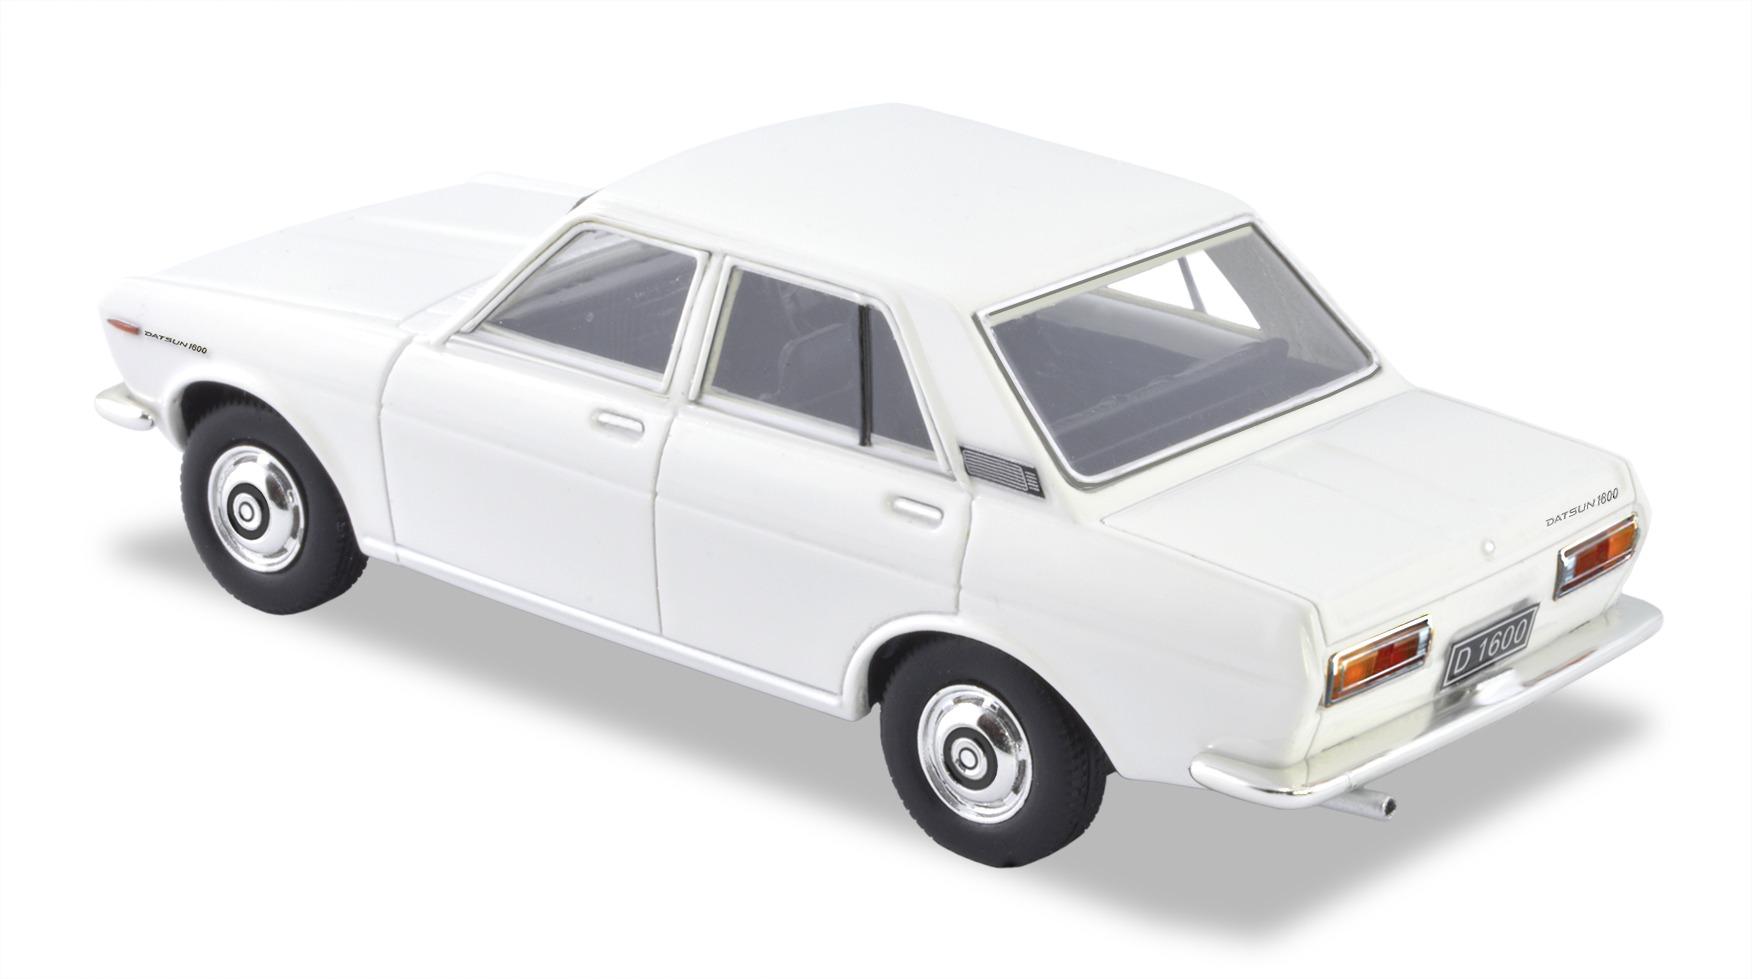 1970 Datsun 1600 – White